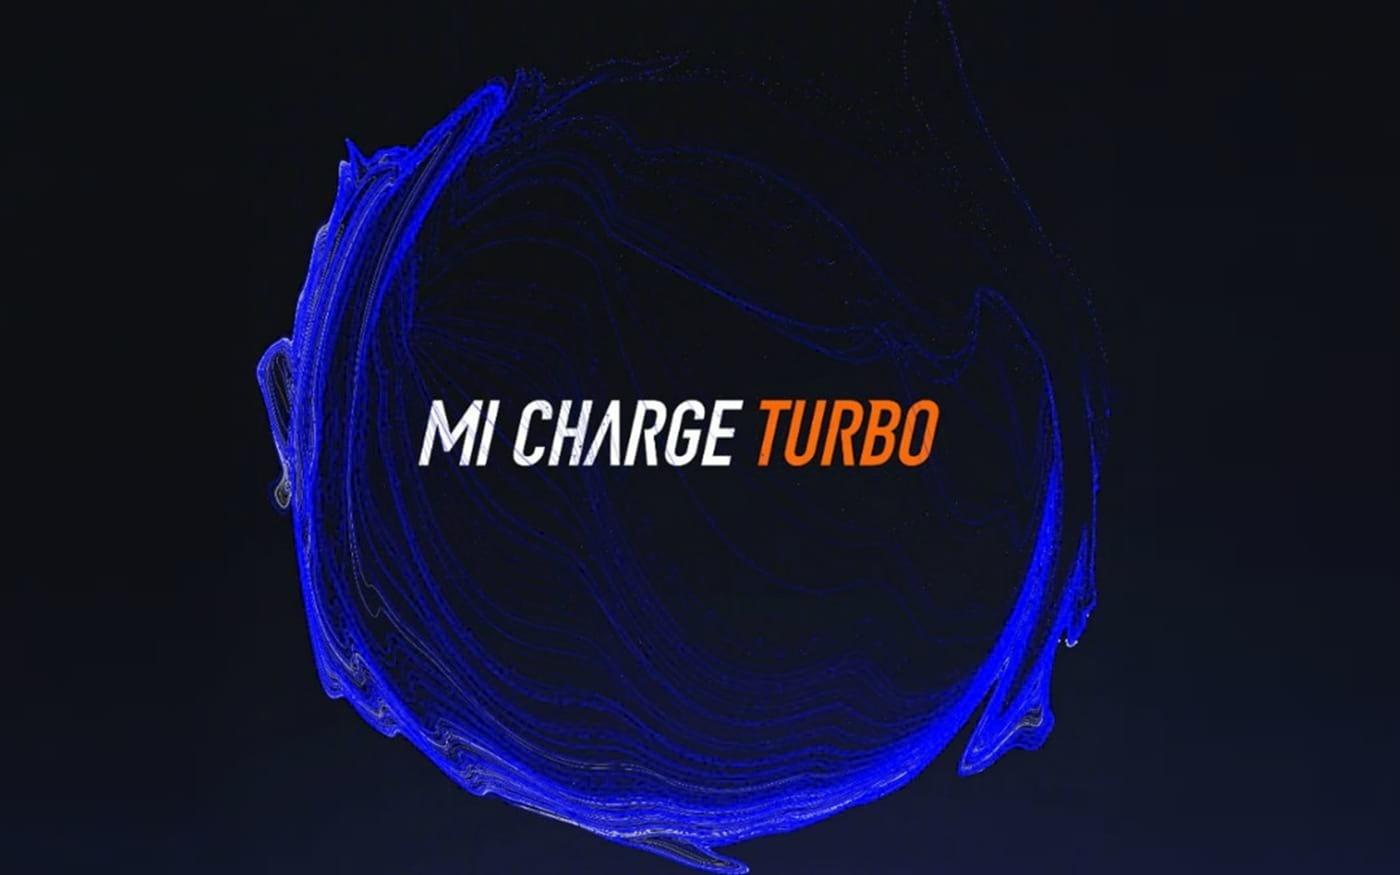 Mi Charge Turbo: Xiaomi lança carregador sem fio de 30W